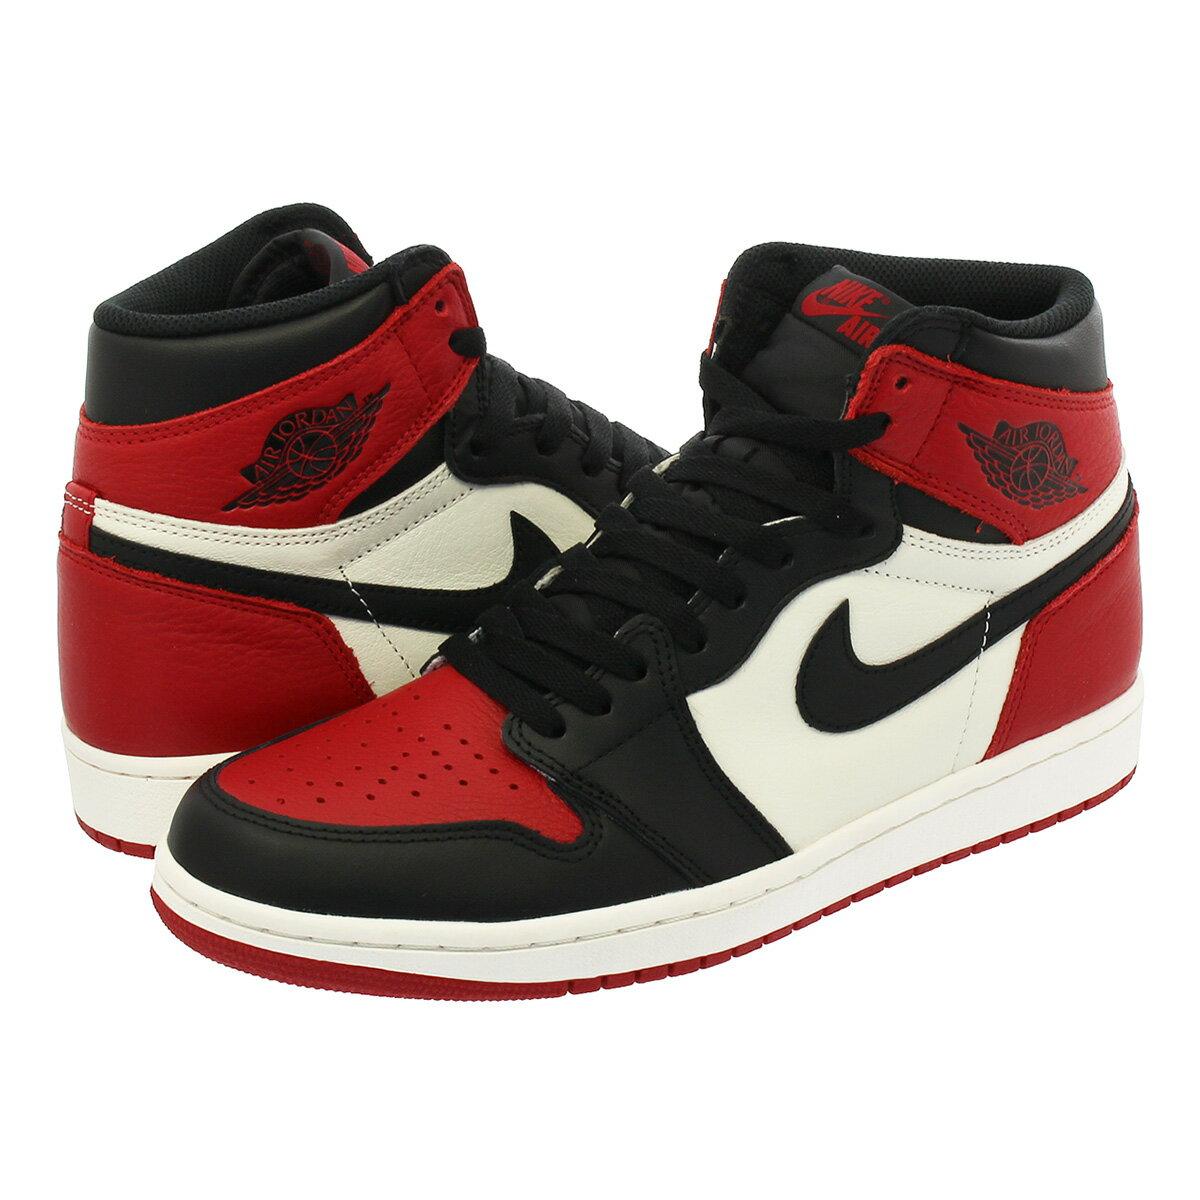 jordan retro 1 red black